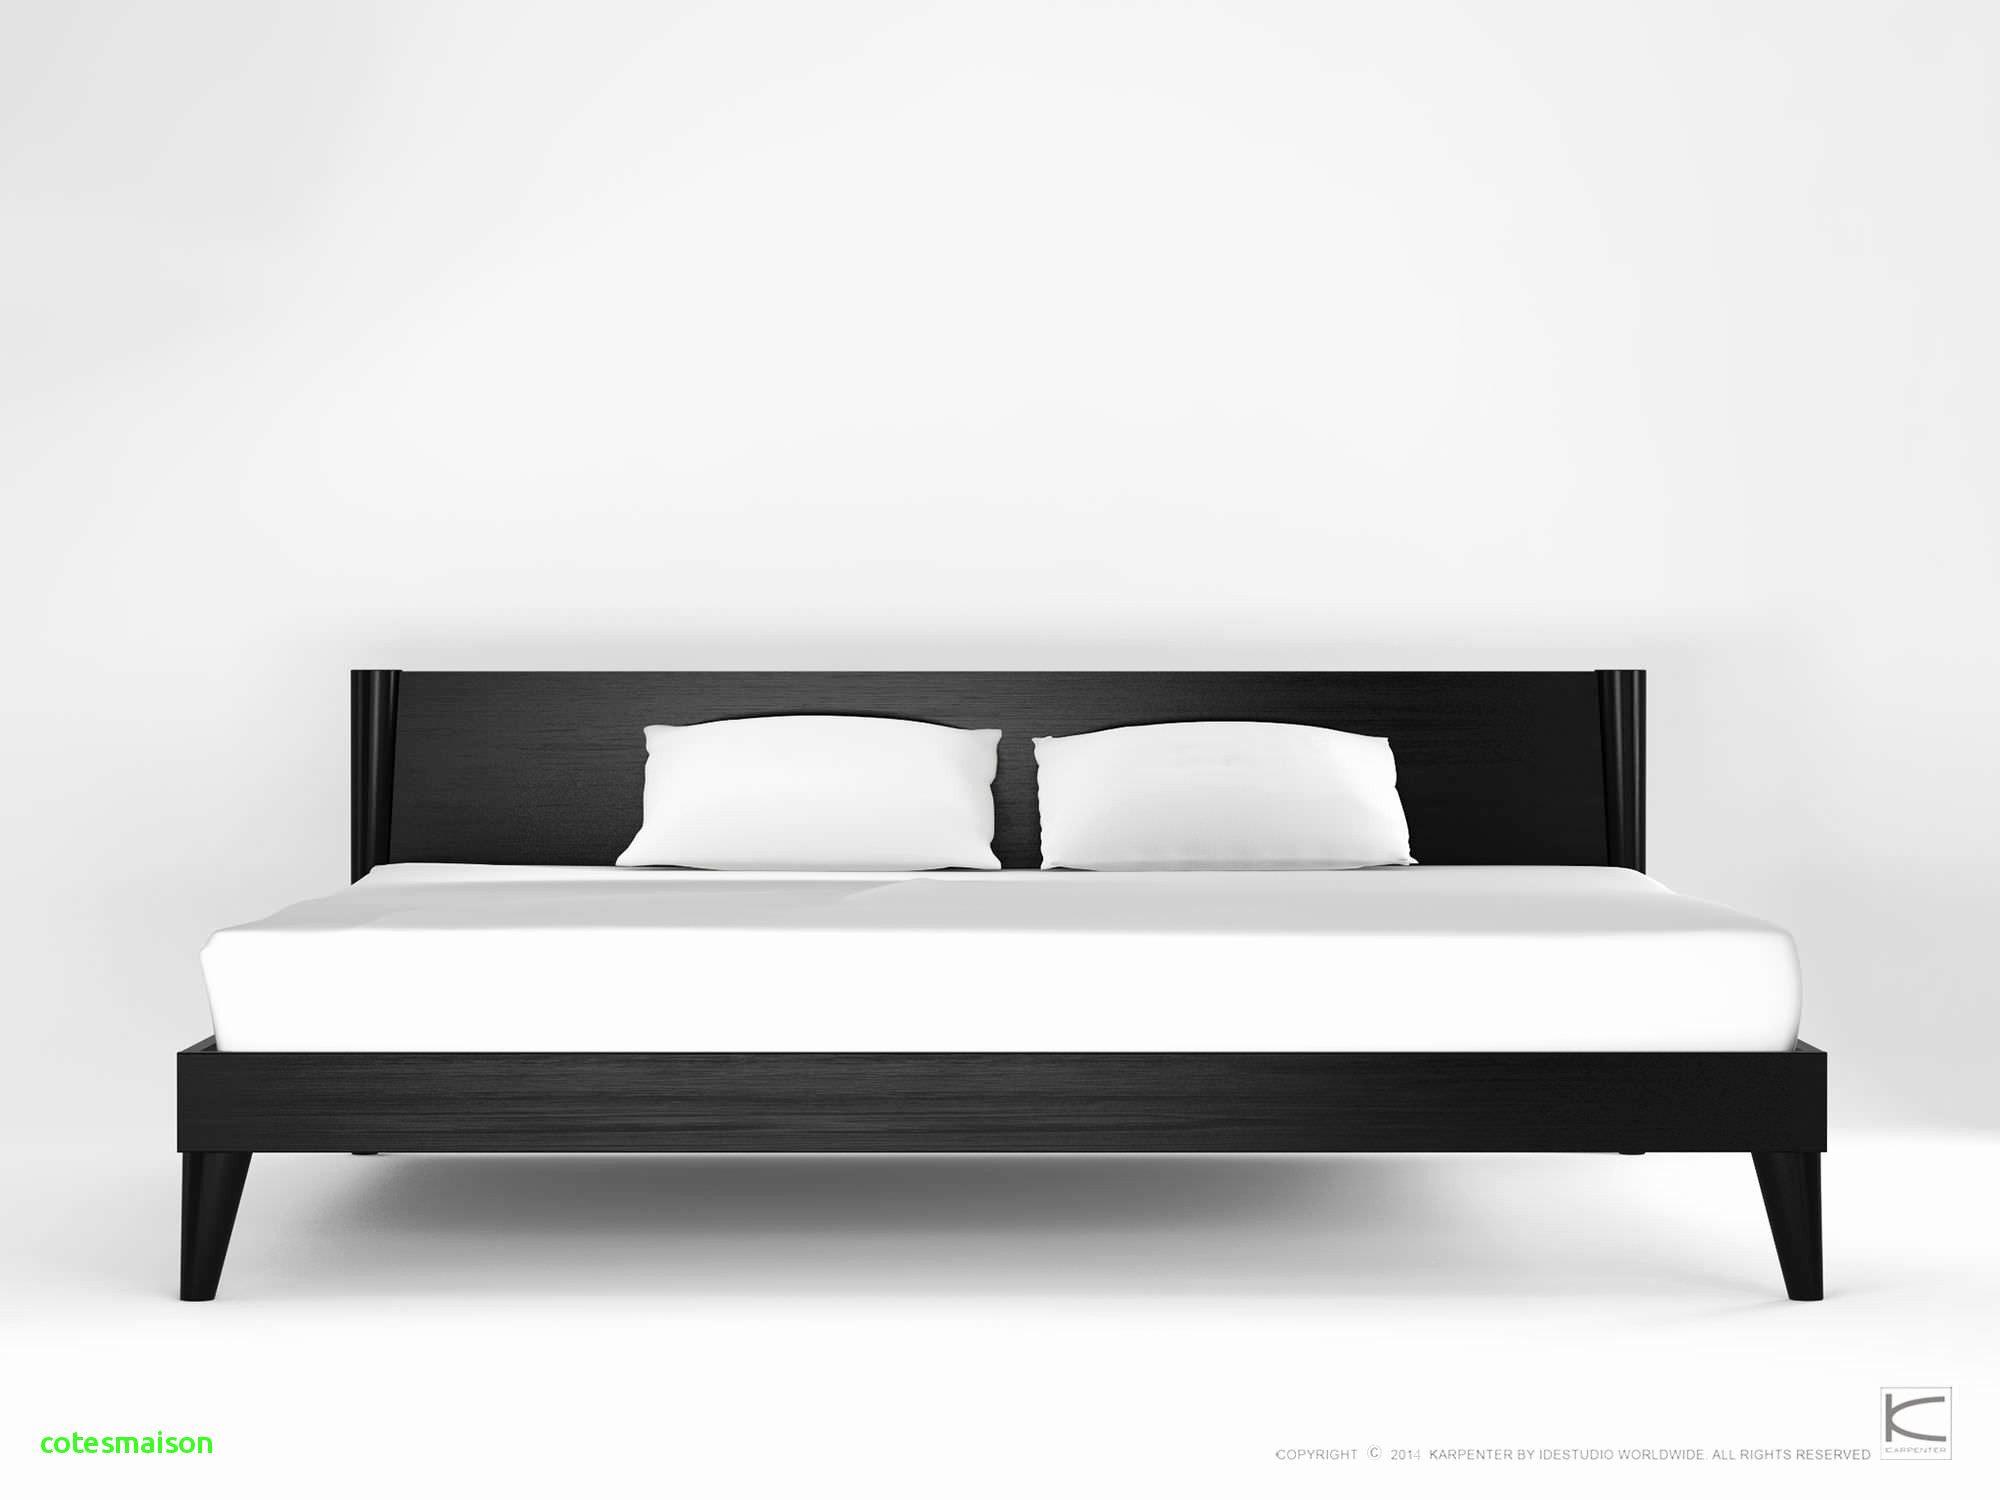 Lit Rond Ikea Charmant Hemnes Ikea Lit Hemnes Daybed Google Search Chambre Louna Pinterest